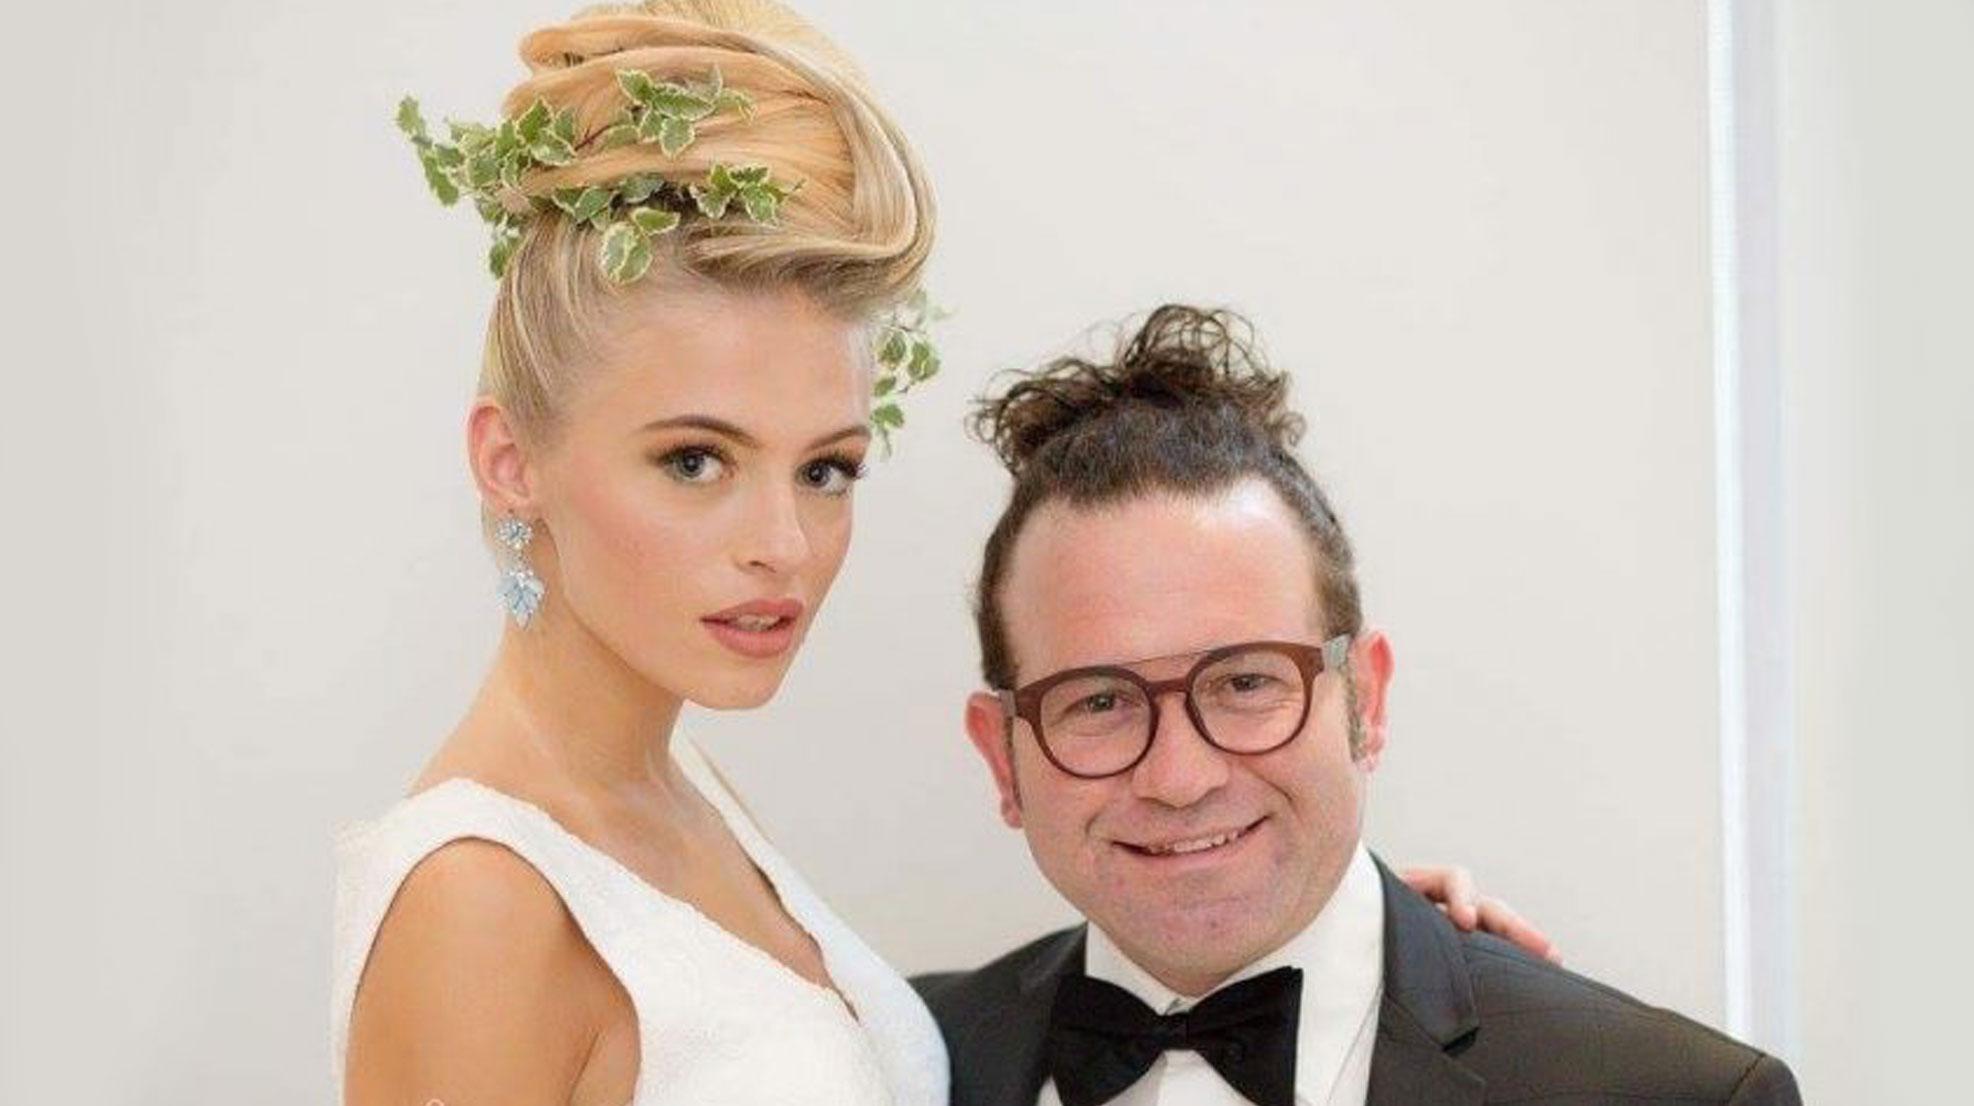 The bridal hair trends 2019 celebreMagazine  by Carmelo Spina celebreMagazine